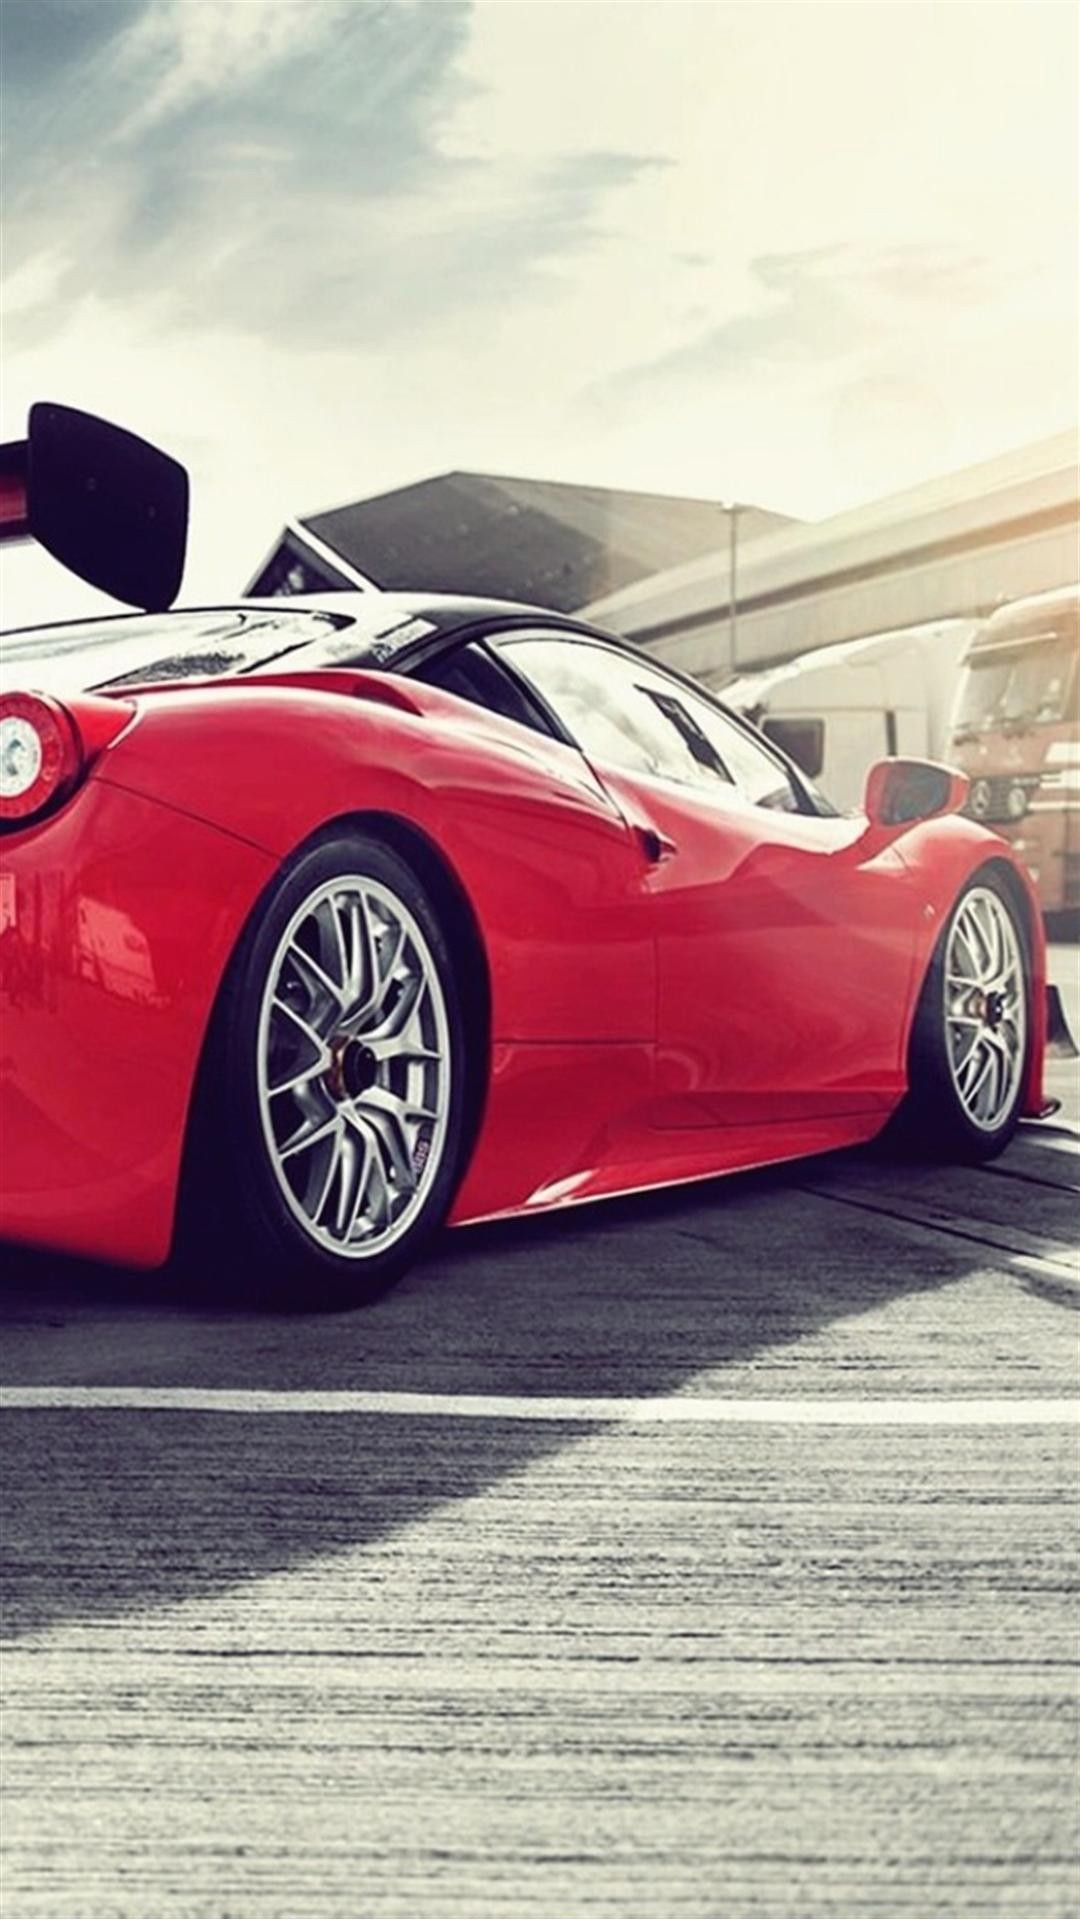 Ferrari 458 Italia Gt3 Smartphone Wallpaper And Lockscreen Hd